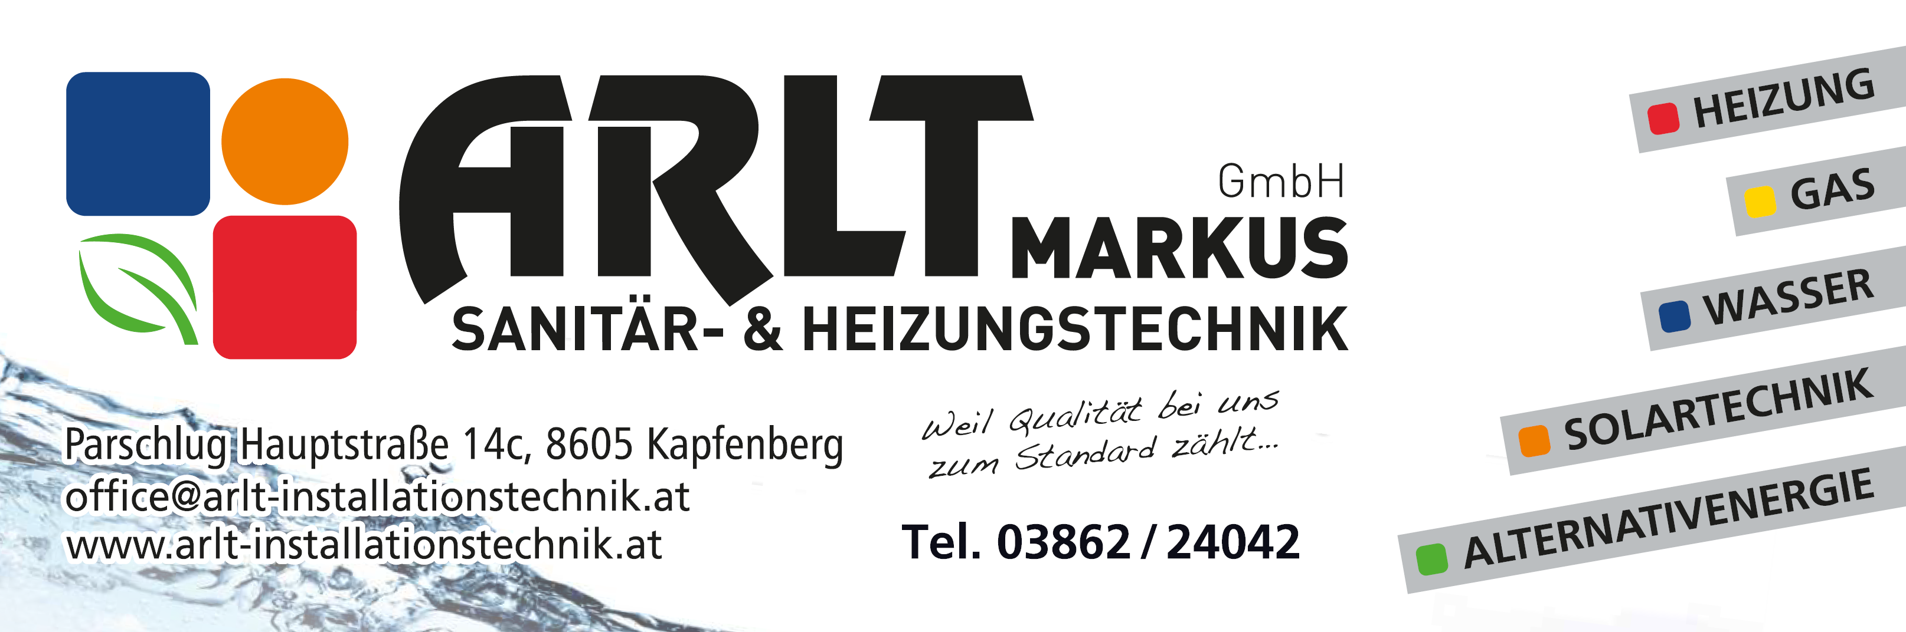 Arlt Markus GmbH